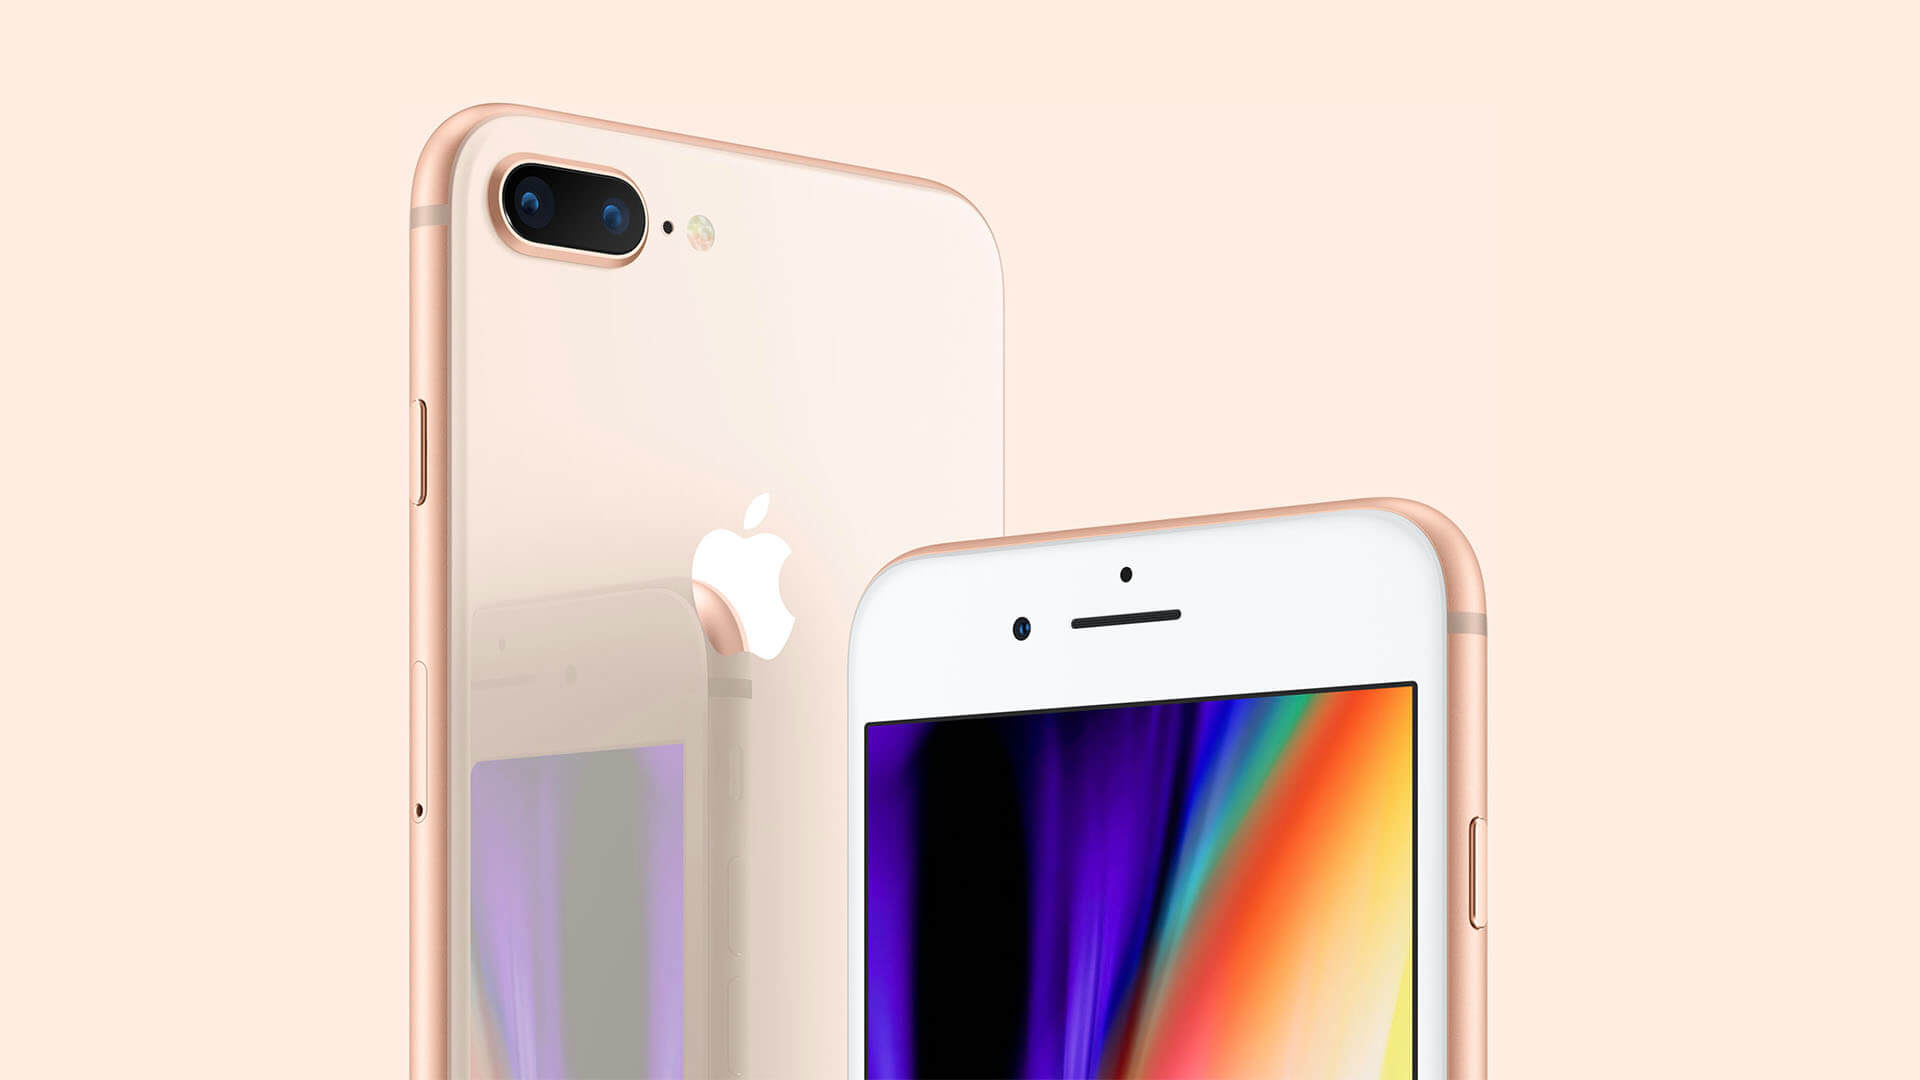 iPhone 8 / iPhone 8 Plusの料金をSIMフリー・ドコモ・au・ソフトバンクで比較